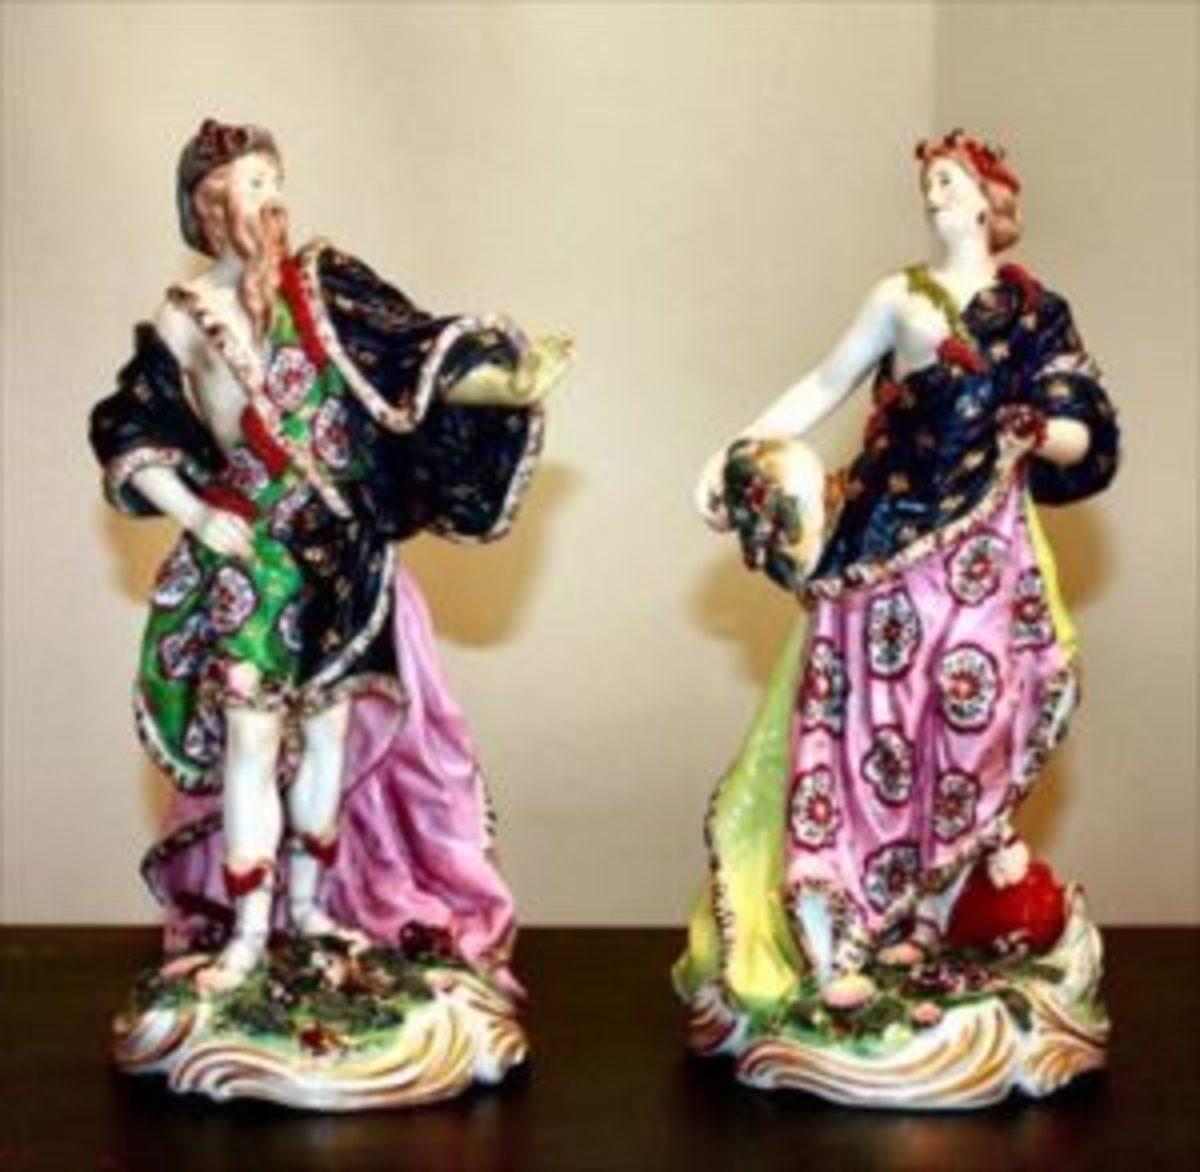 Meissen porcelain figures